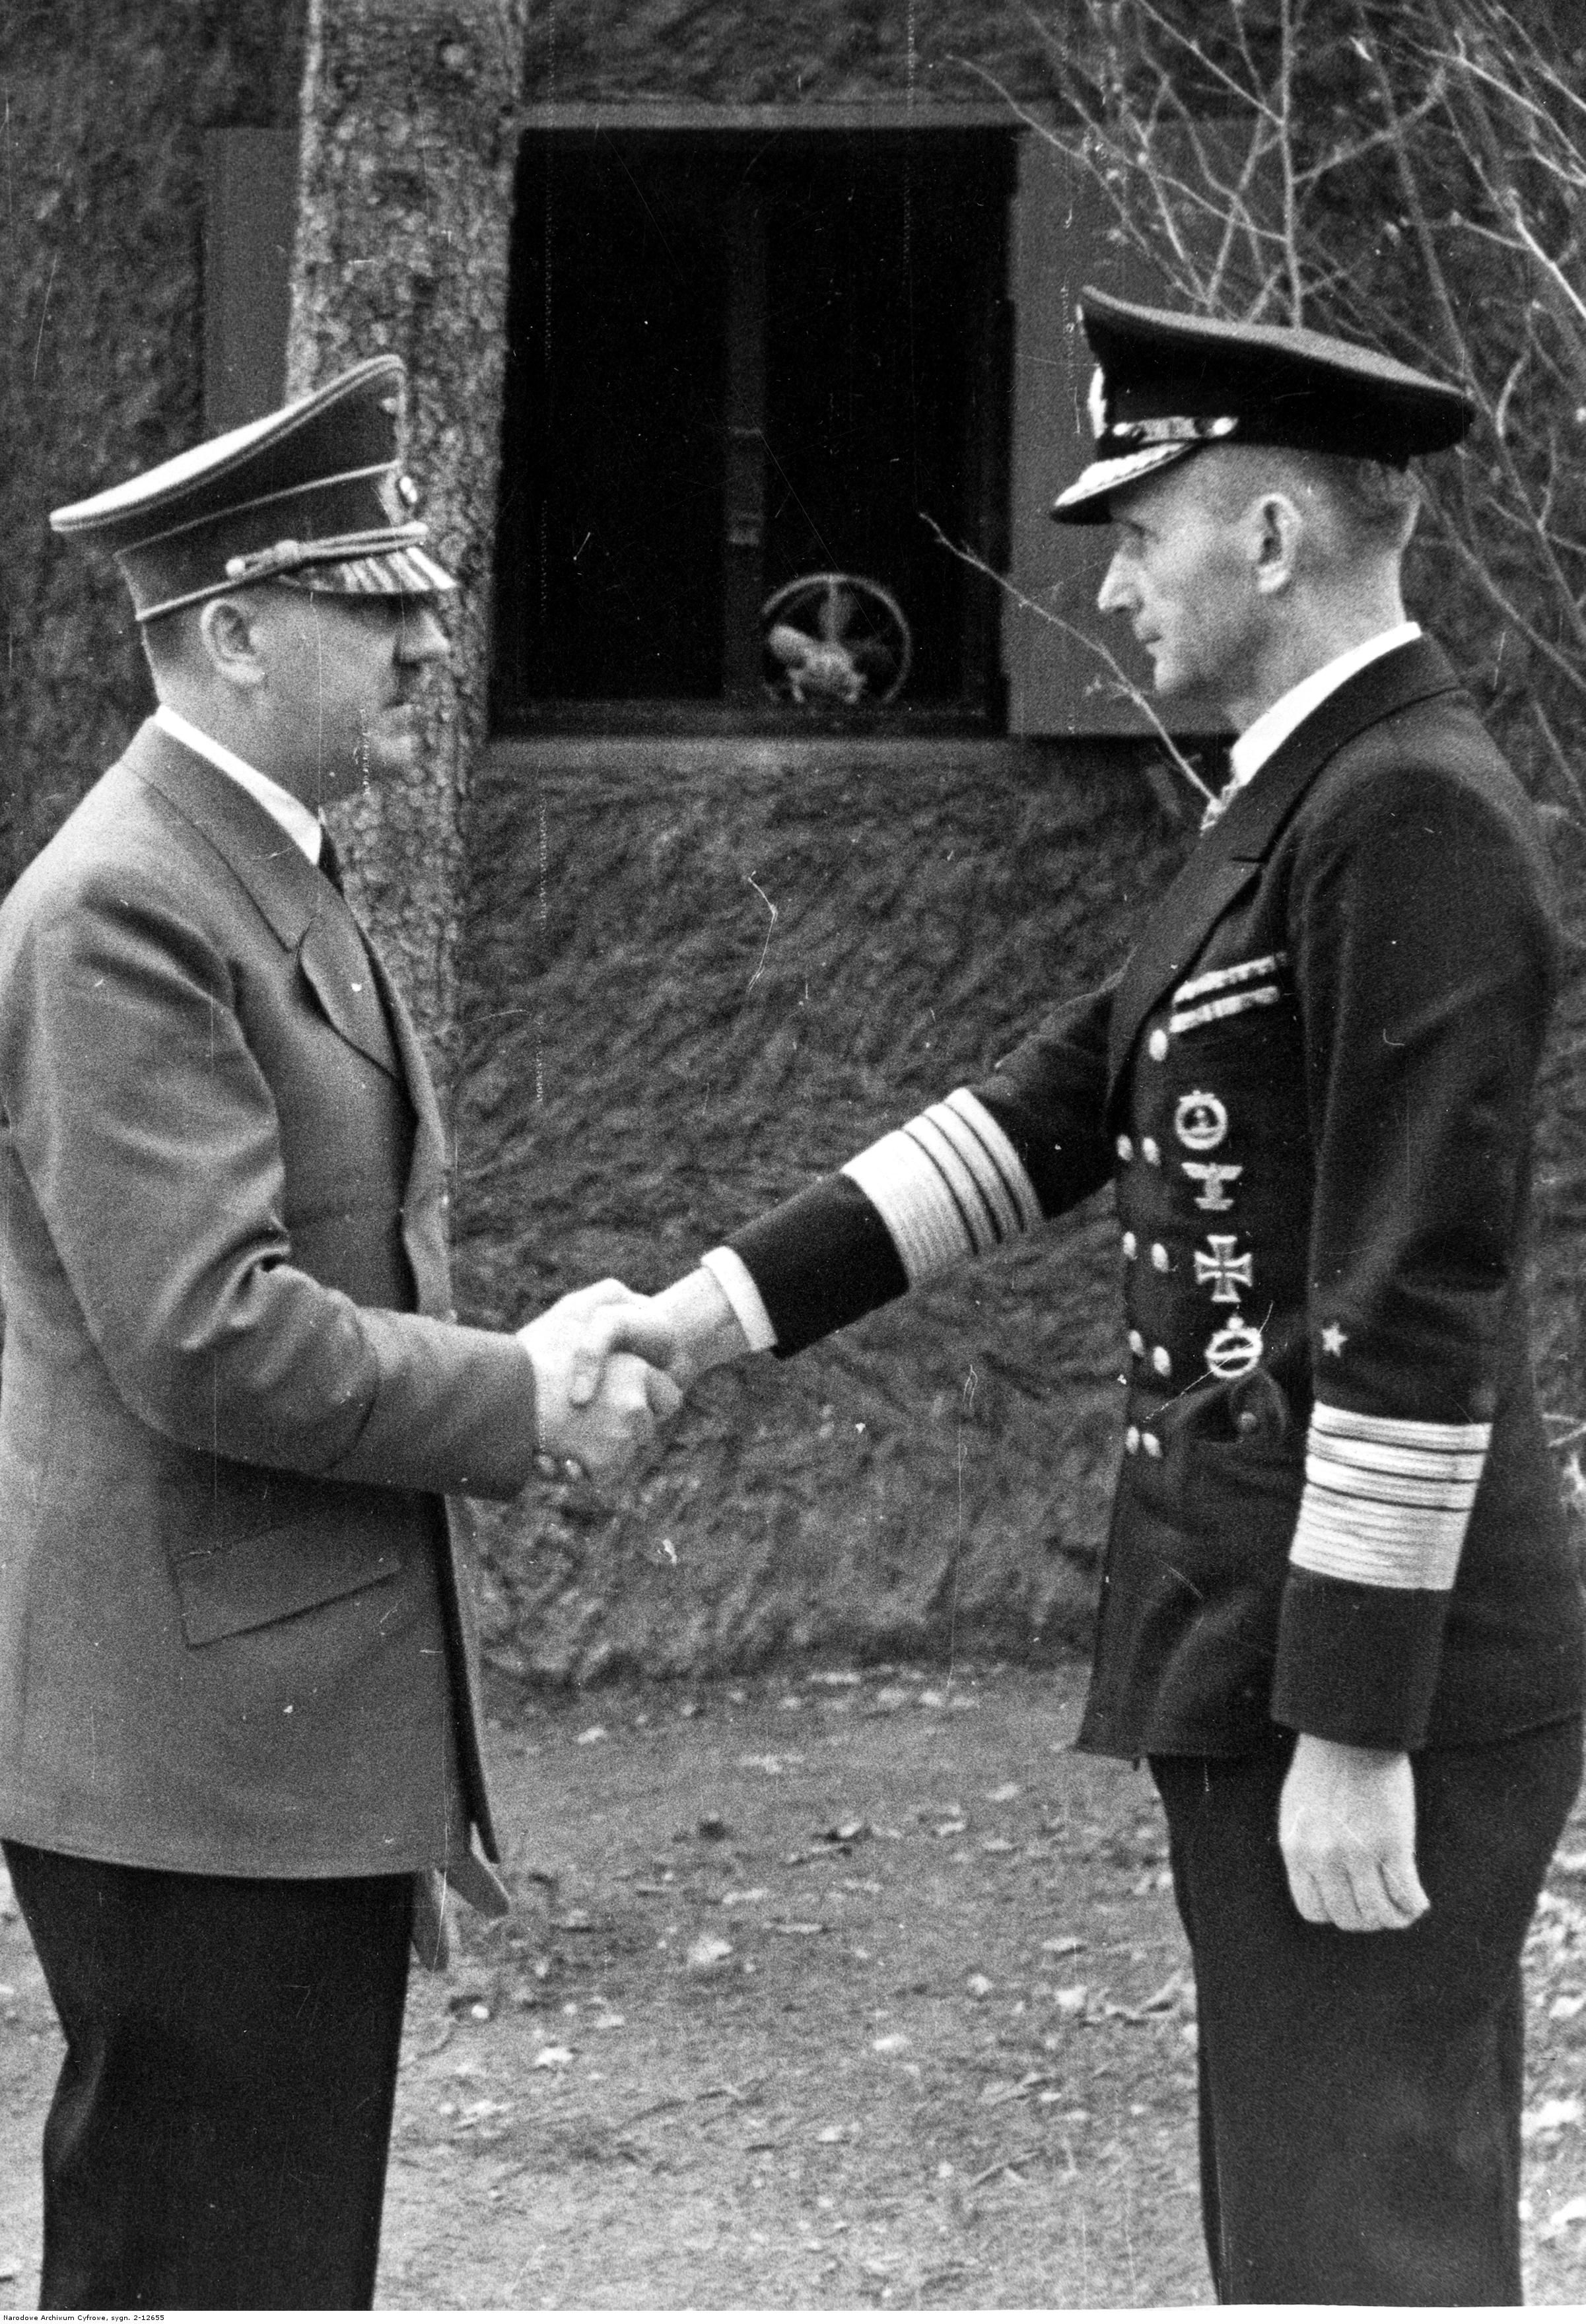 first great awakening essay Adolf Hitler